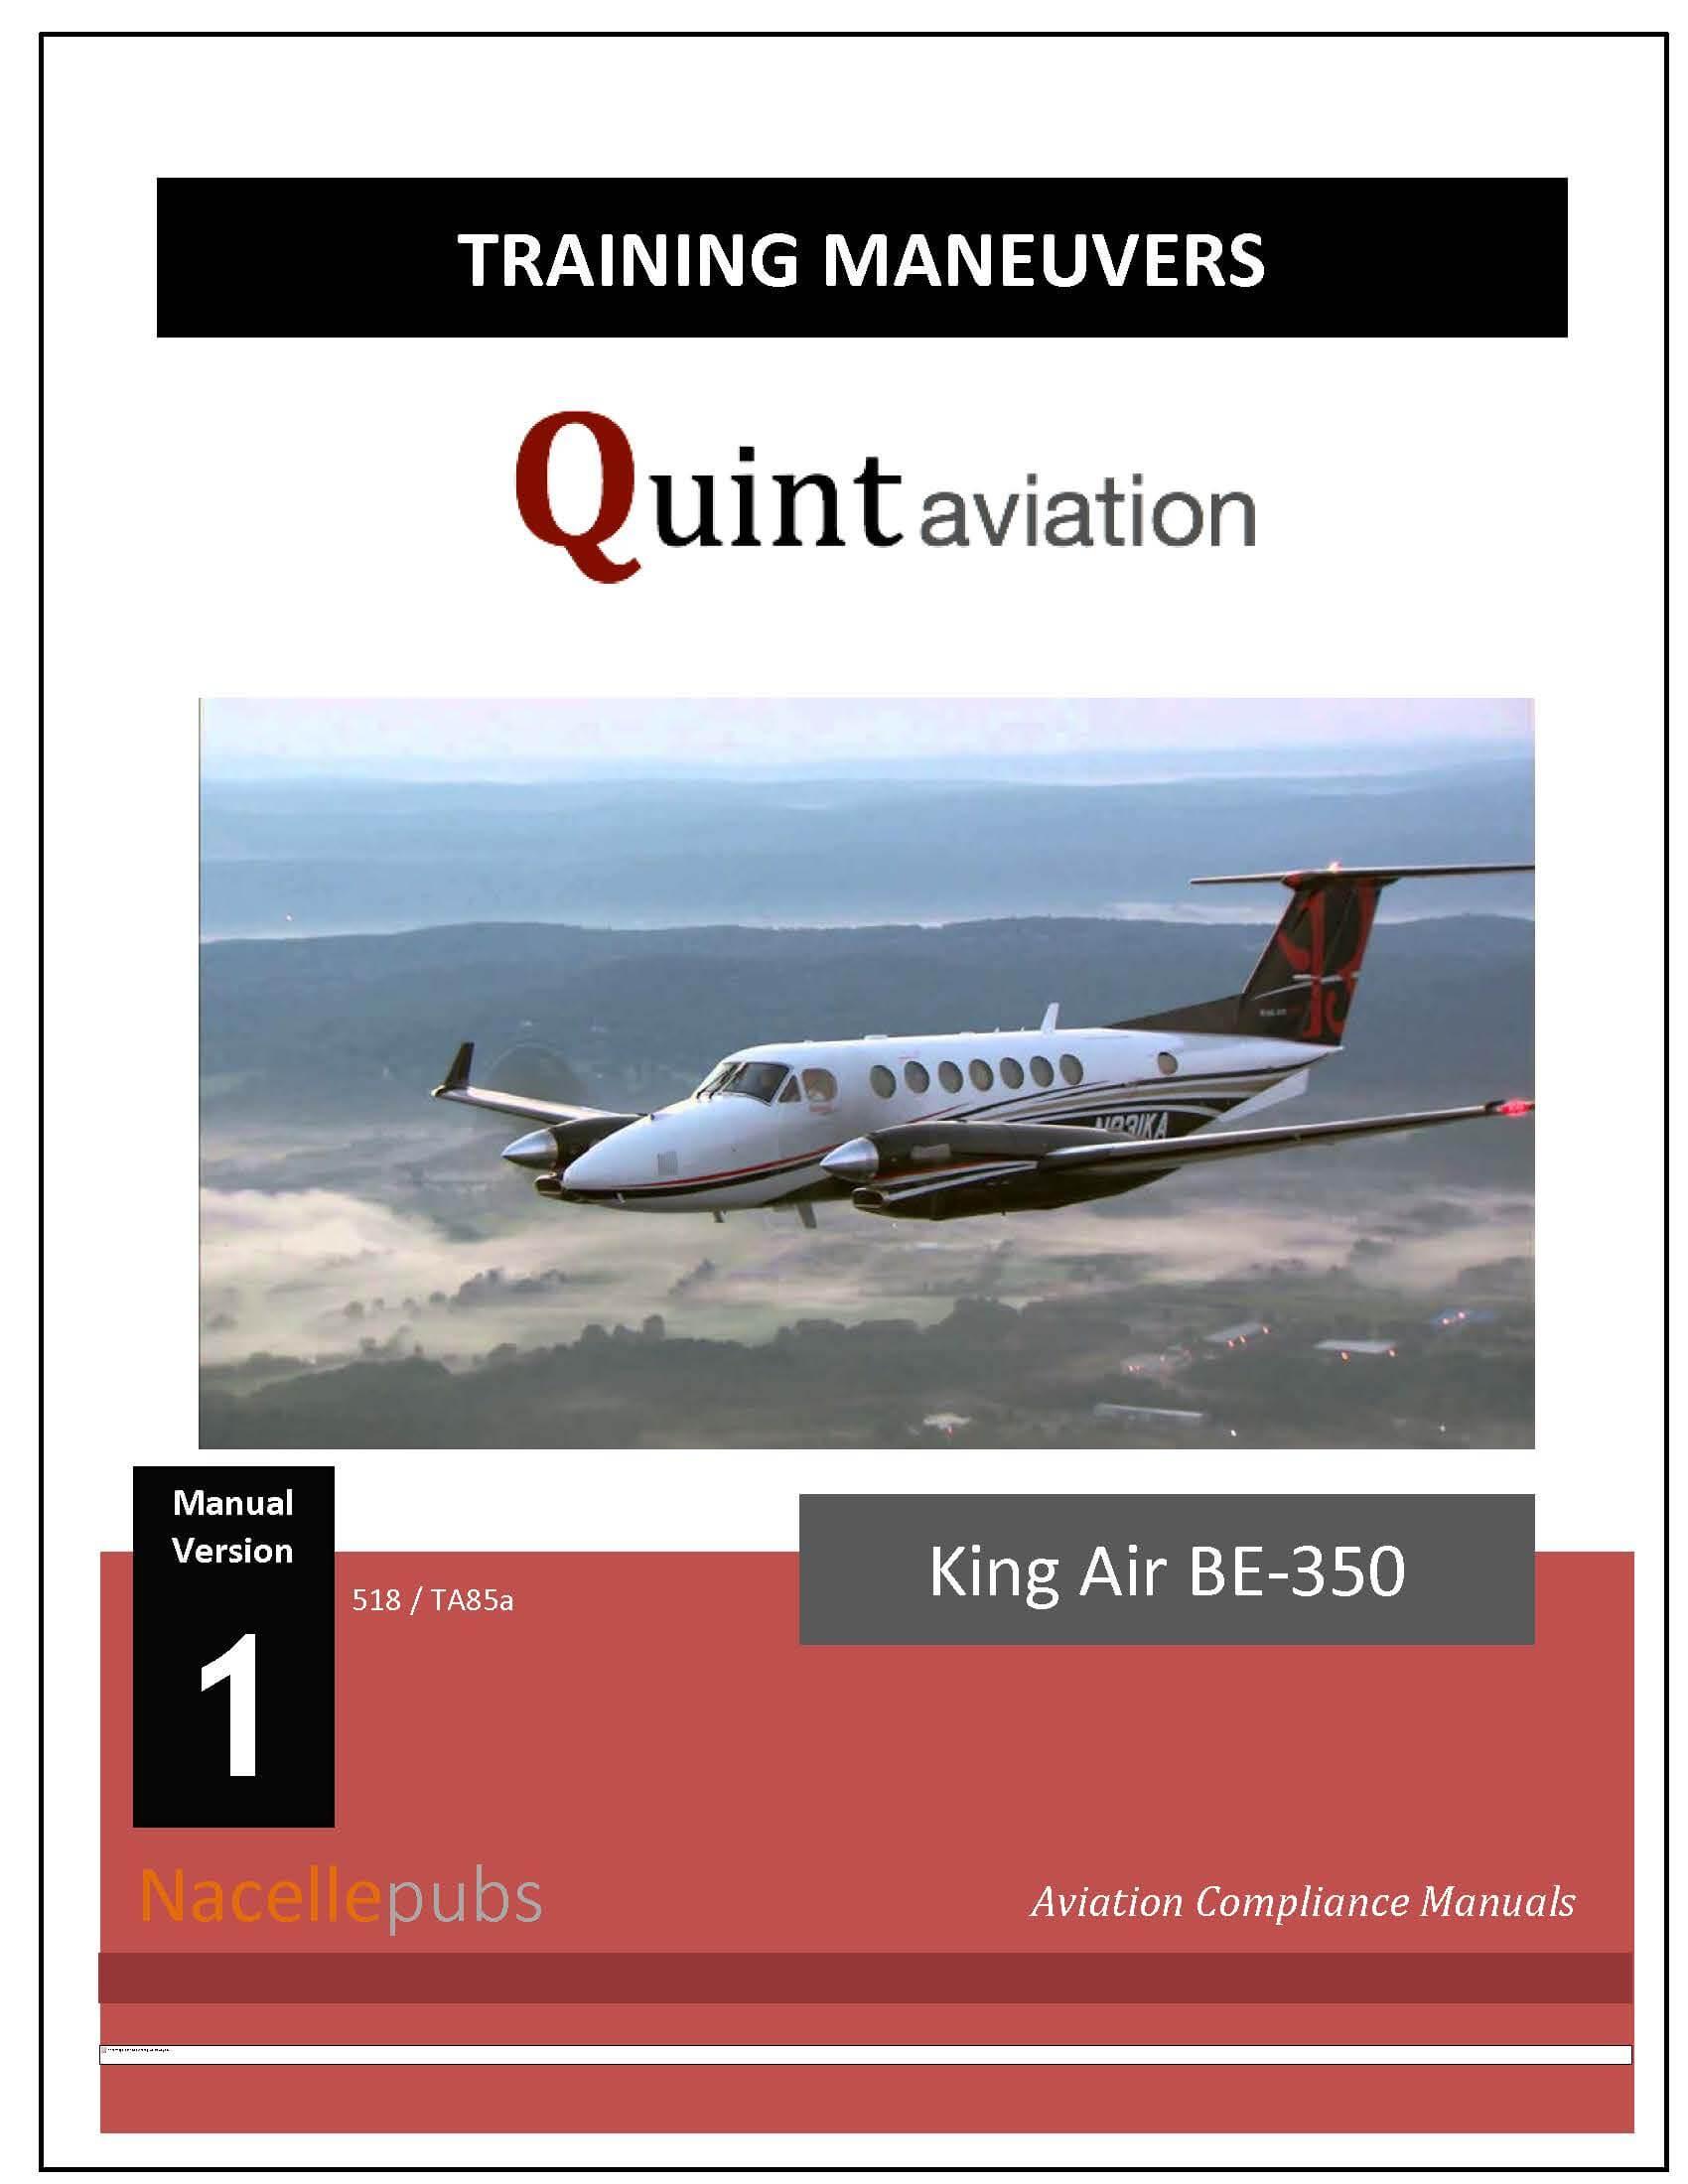 FAA Part 135 Training Program - Airplane Maneuvers